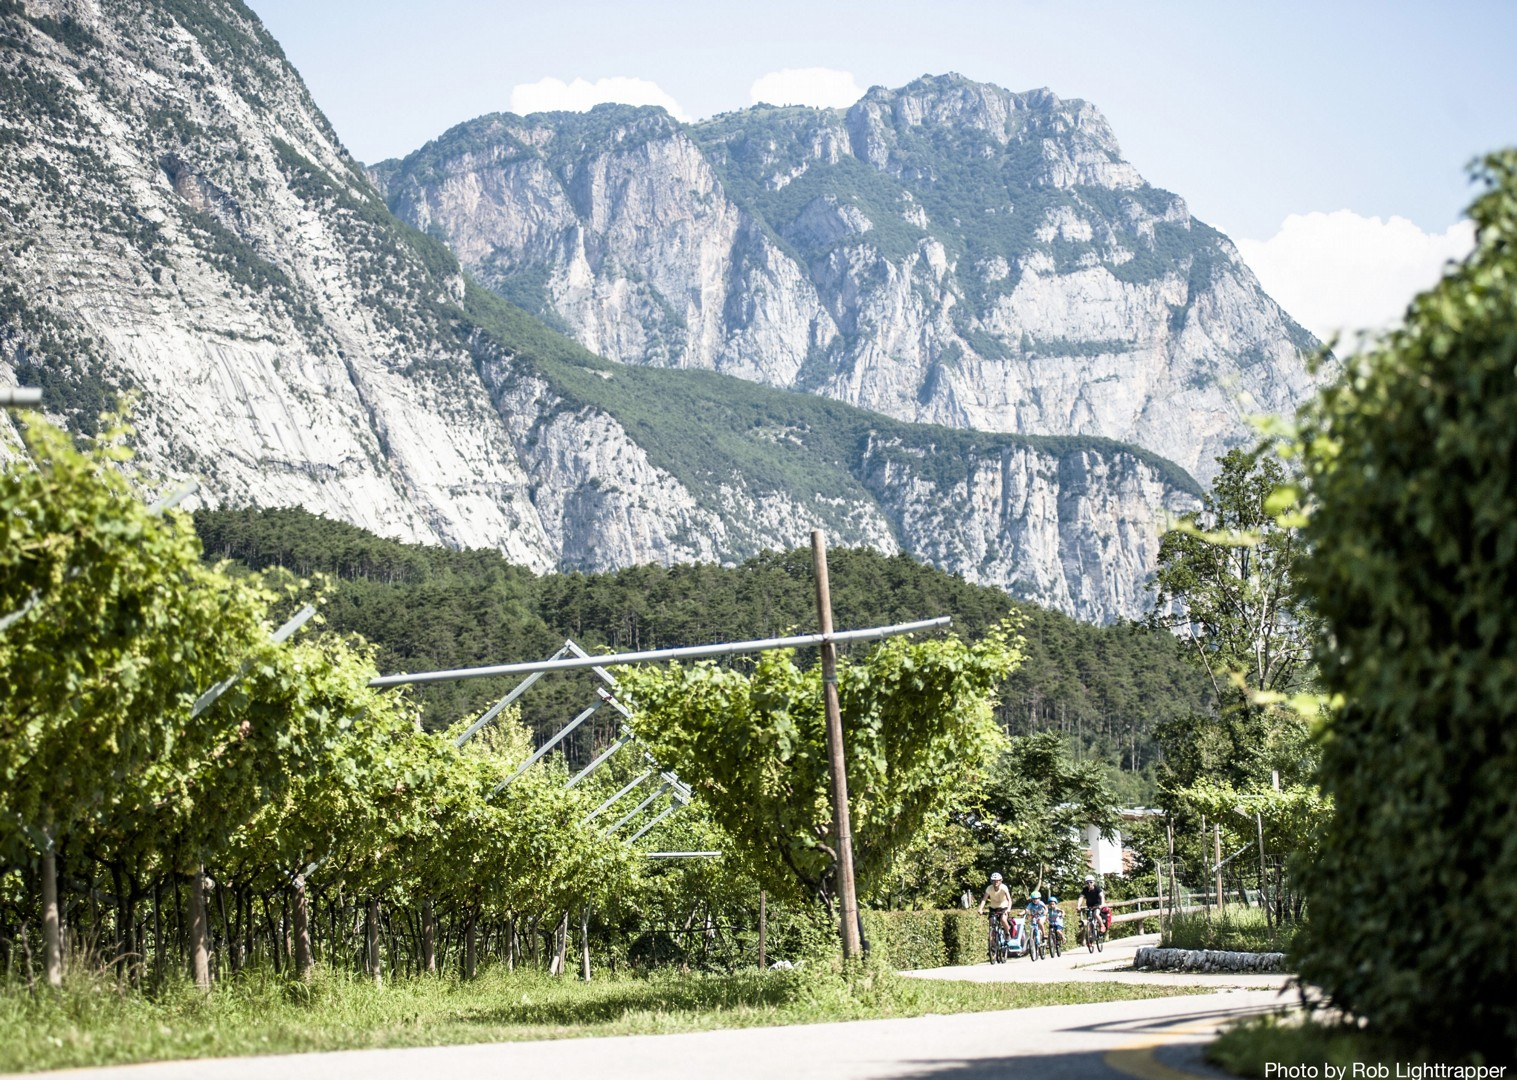 Family-Cycling-Holiday-Lake-Garda-Venice-mountains-of-Italy.jpg - Italy - Lake Garda to Venice - Self-Guided Family Cycling Holiday - Family Cycling